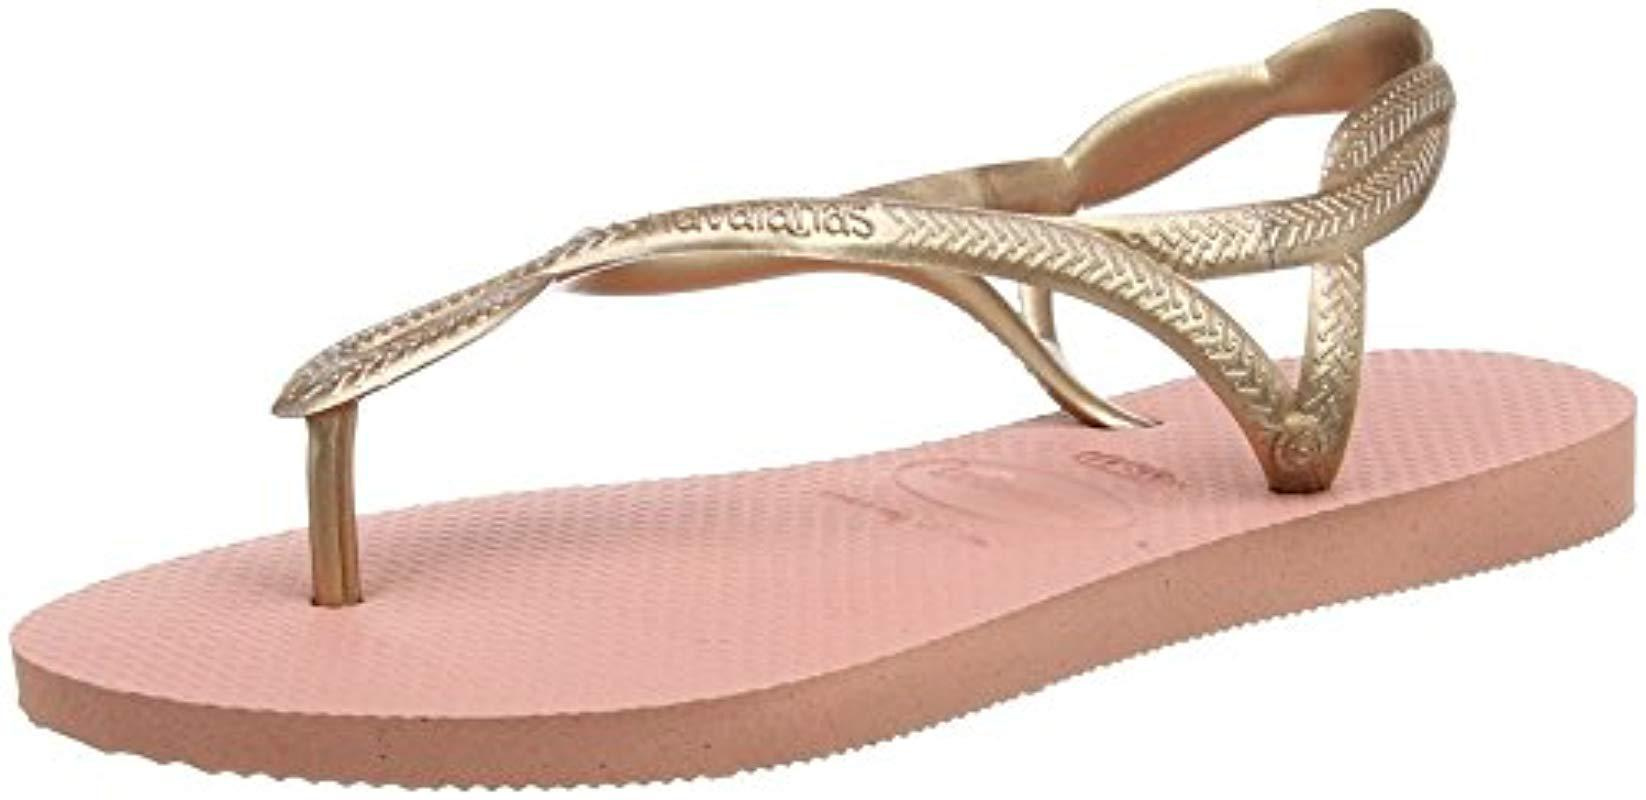 585800091f49d Havaianas Luna Sandals in Pink - Save 4.545454545454547% - Lyst